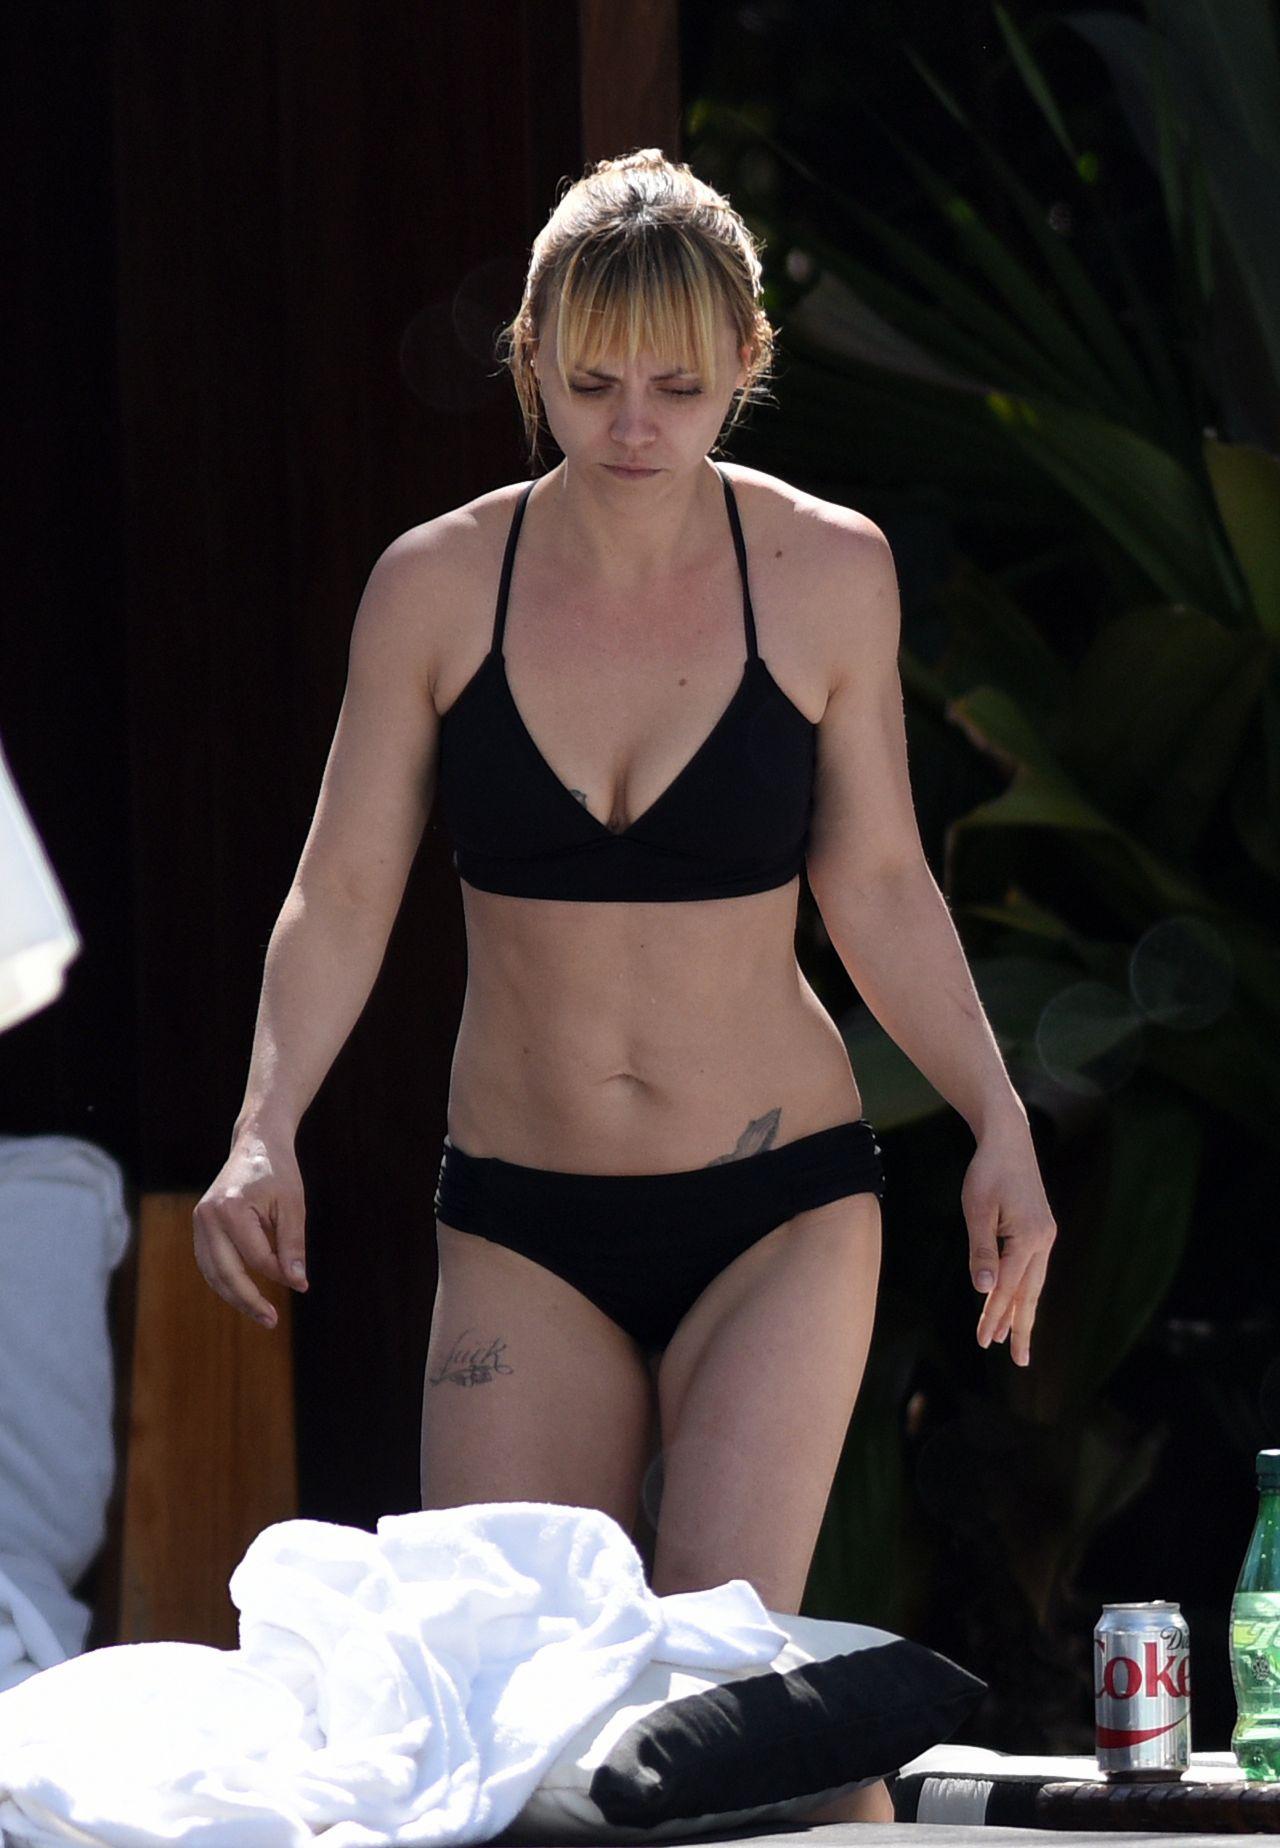 Christina Ricci in Black Bikini at a Pool in Miami, FL ... кристина риччи